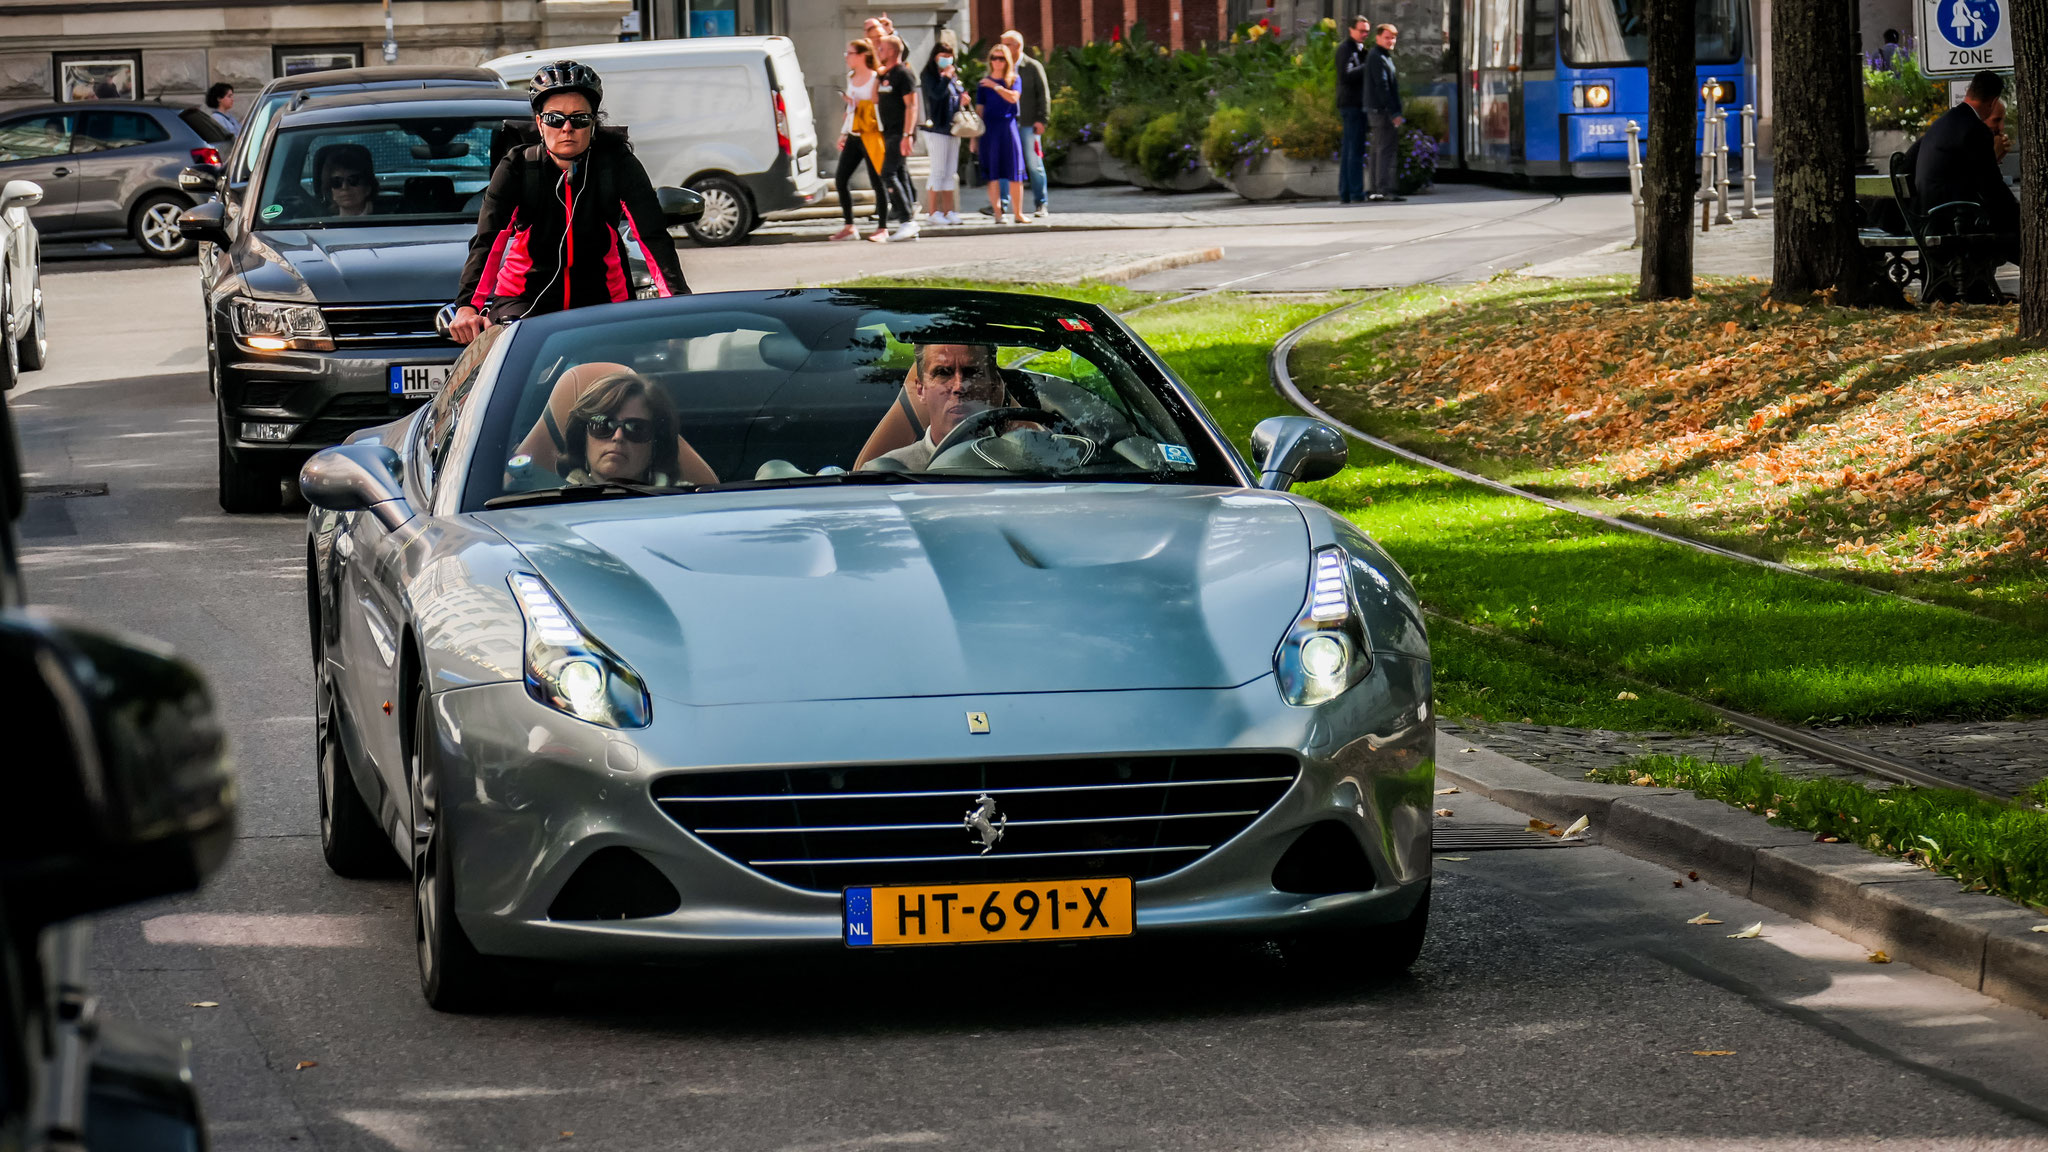 Ferrari California T - HT-691-X (NL)